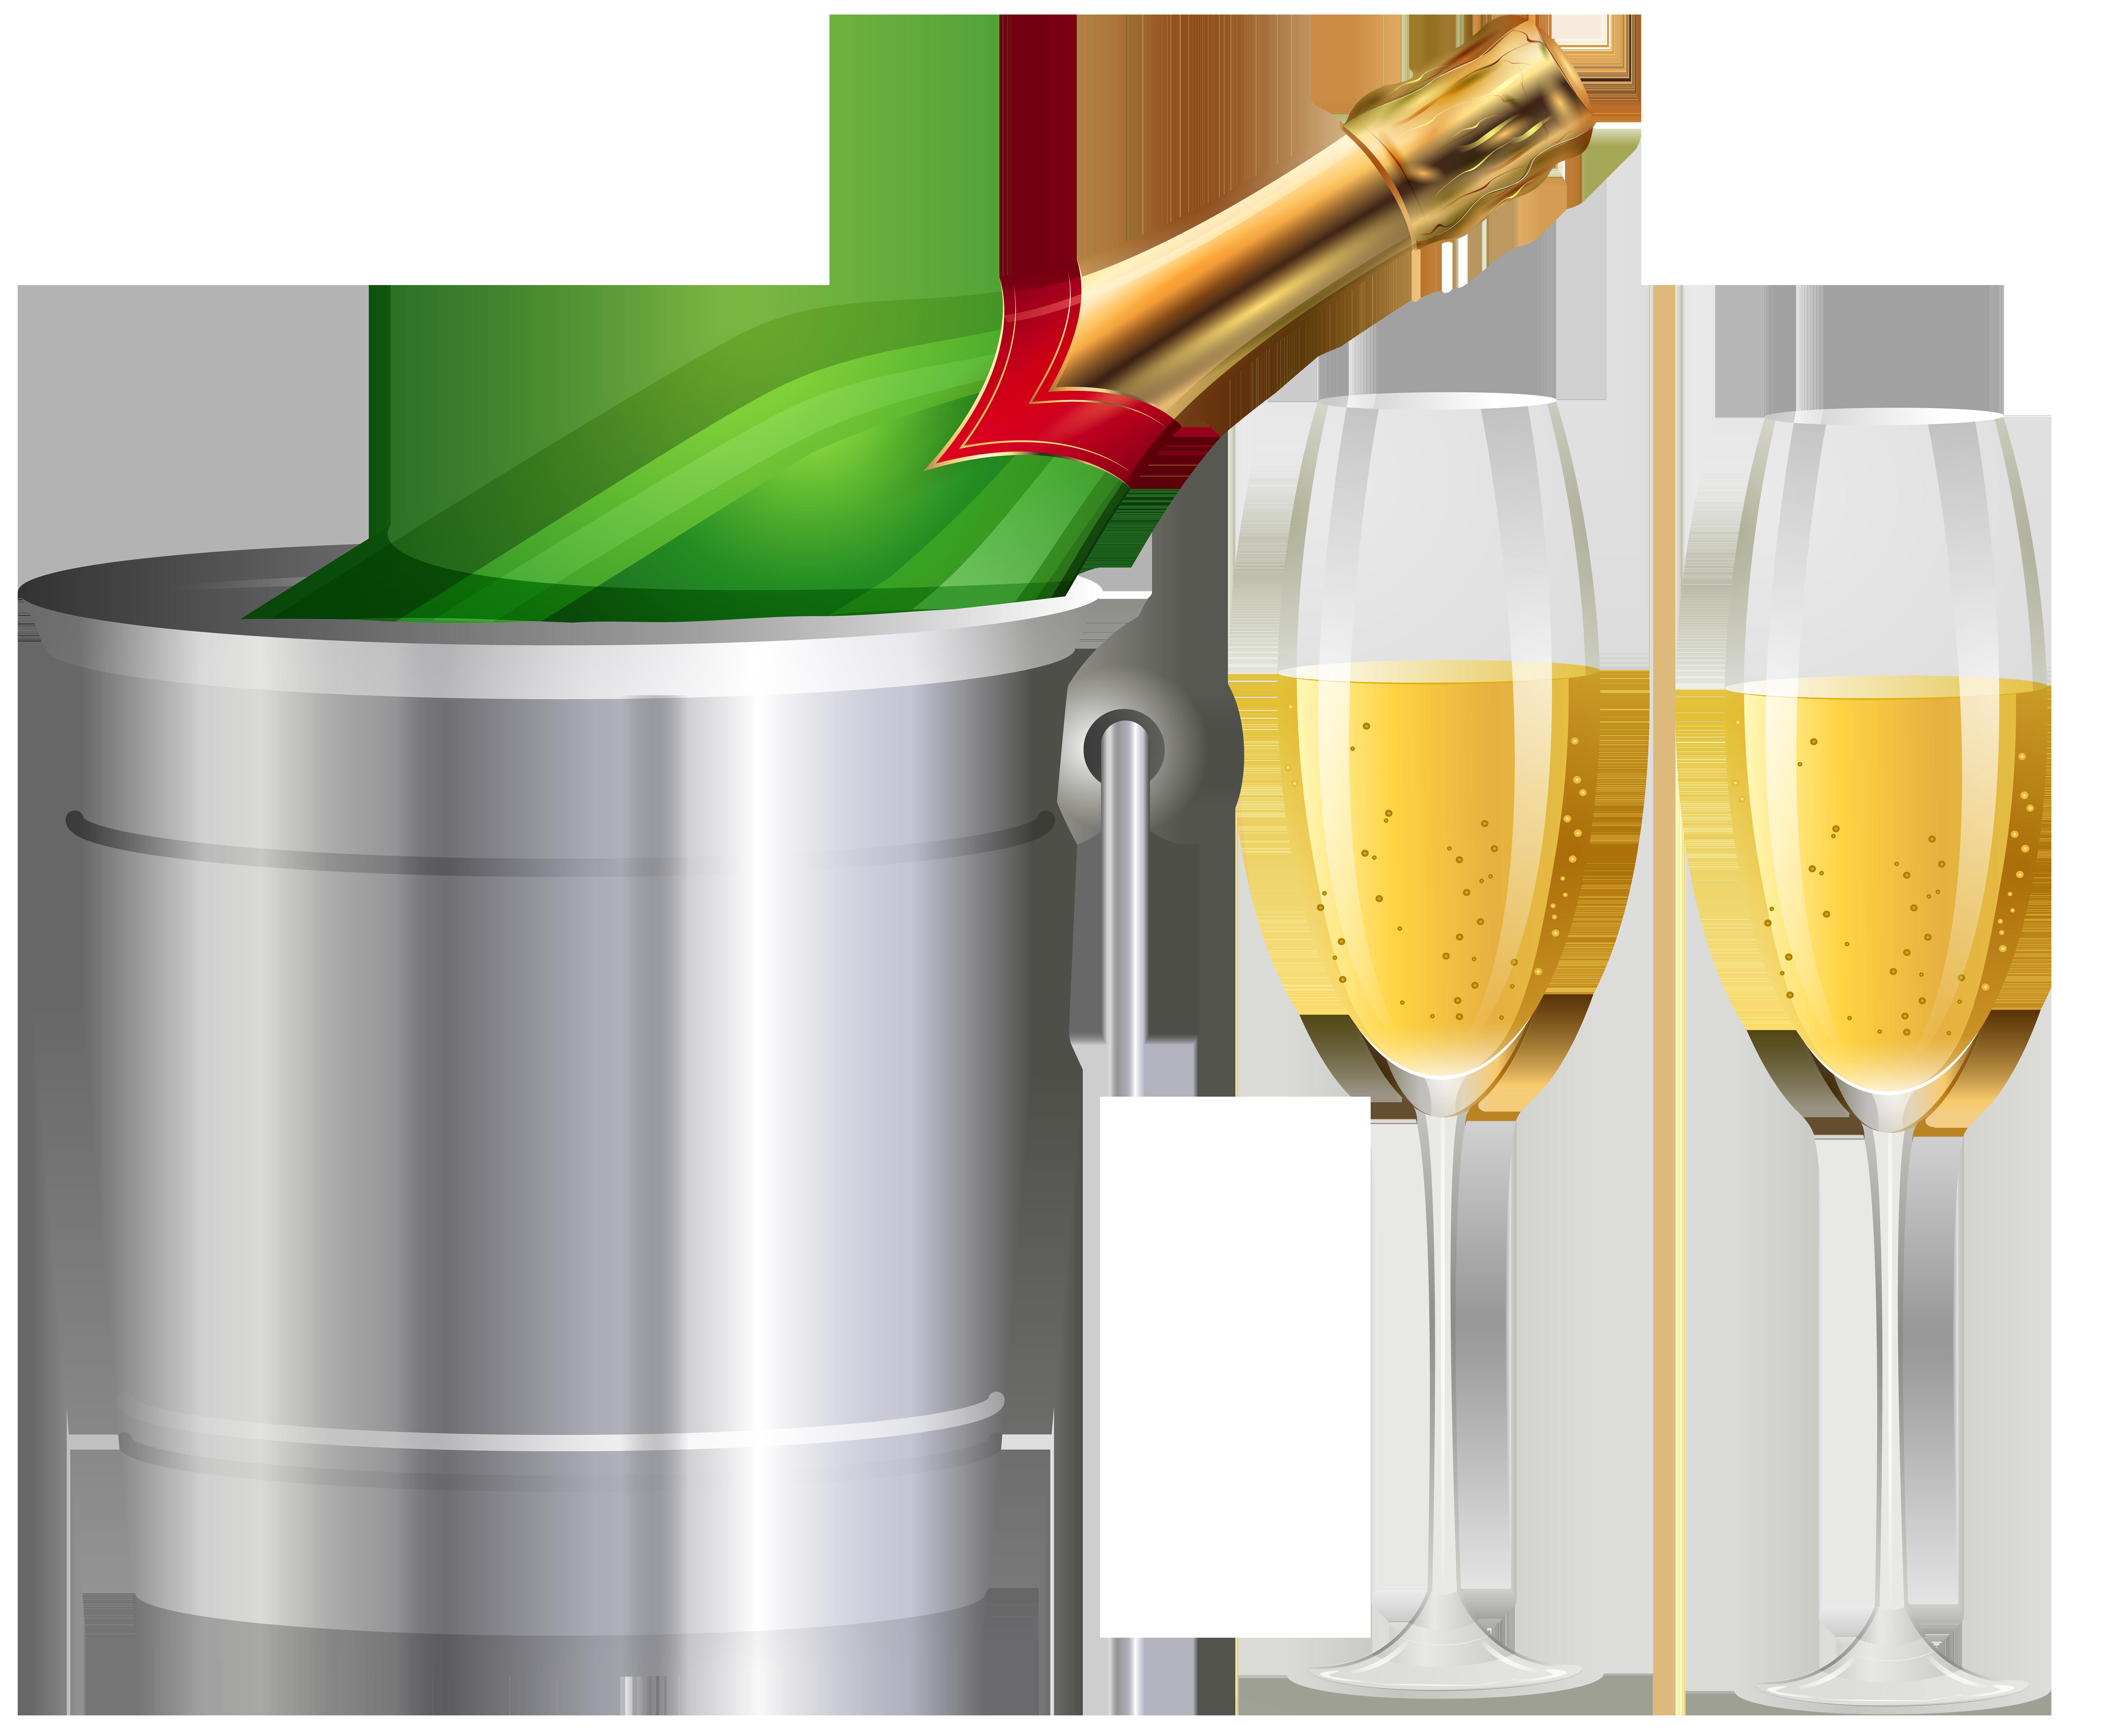 Champagne and glasses transparent. Champaign clipart liquor bottle